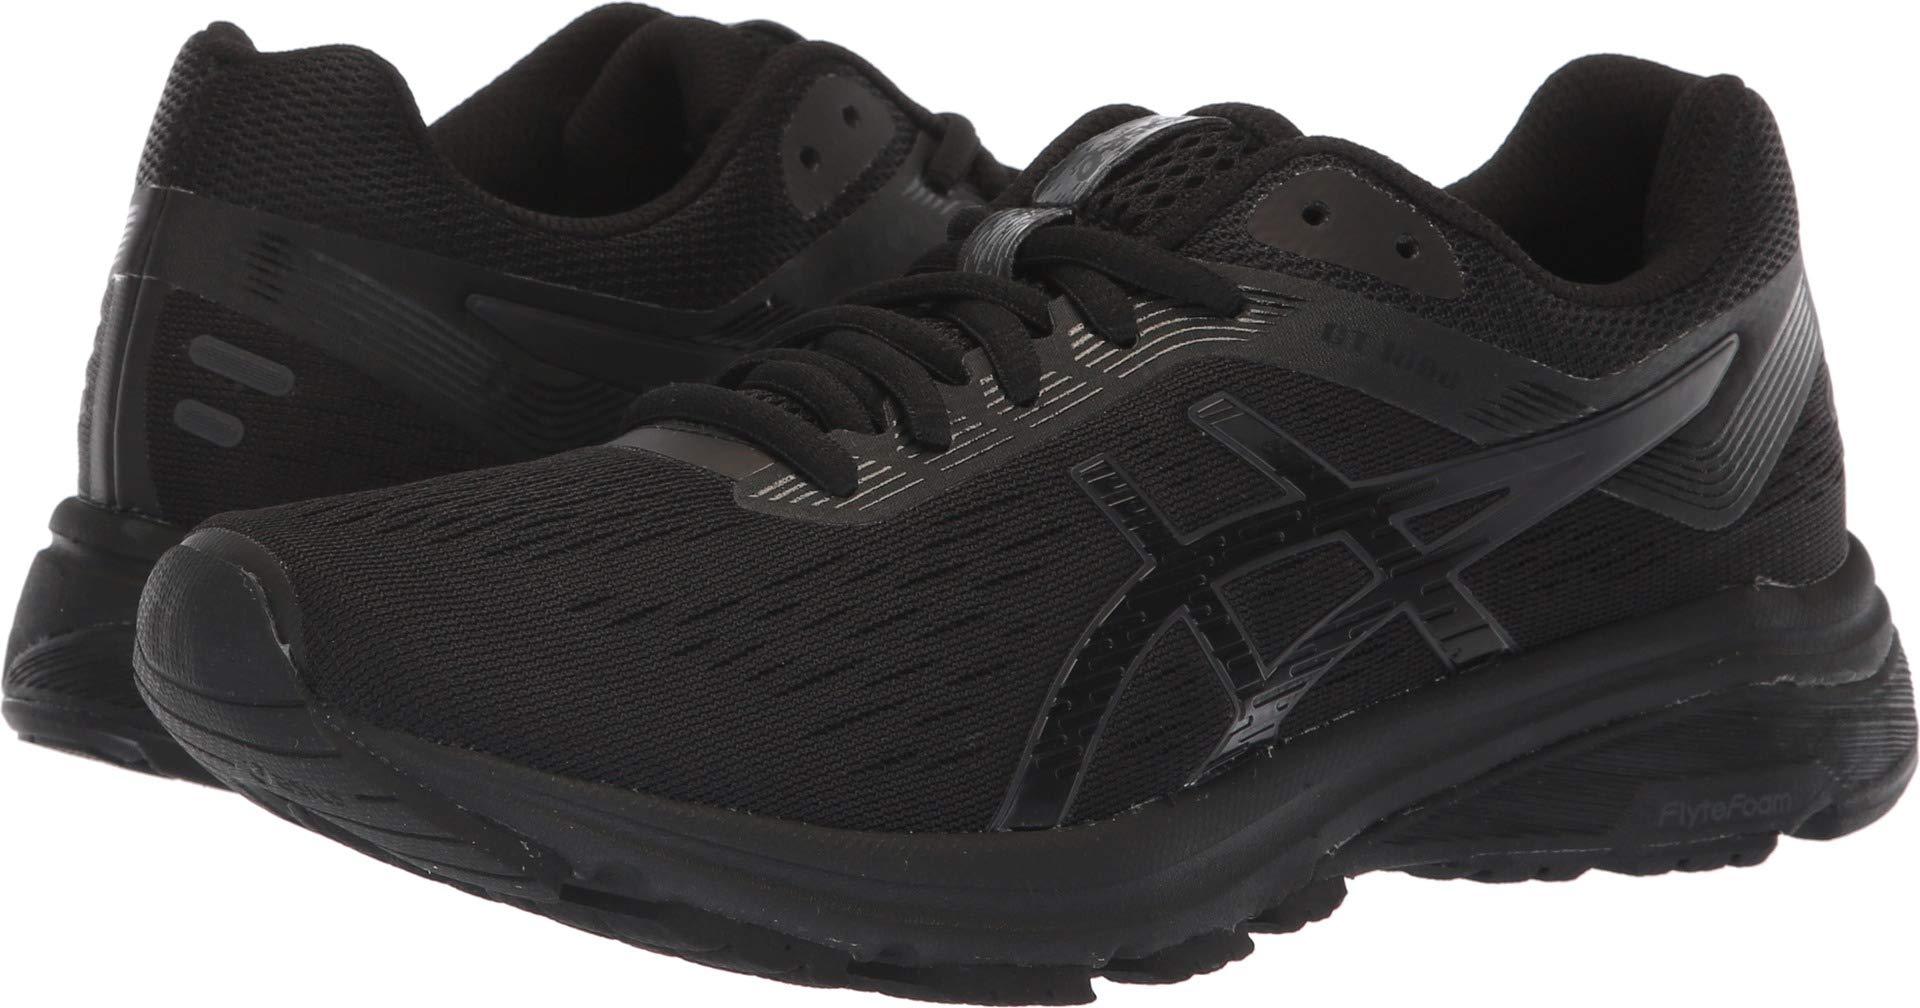 ASICS 1012A030 Women's GT-1000 7 Running Shoe, Black/Phantom - 7 D(M) US